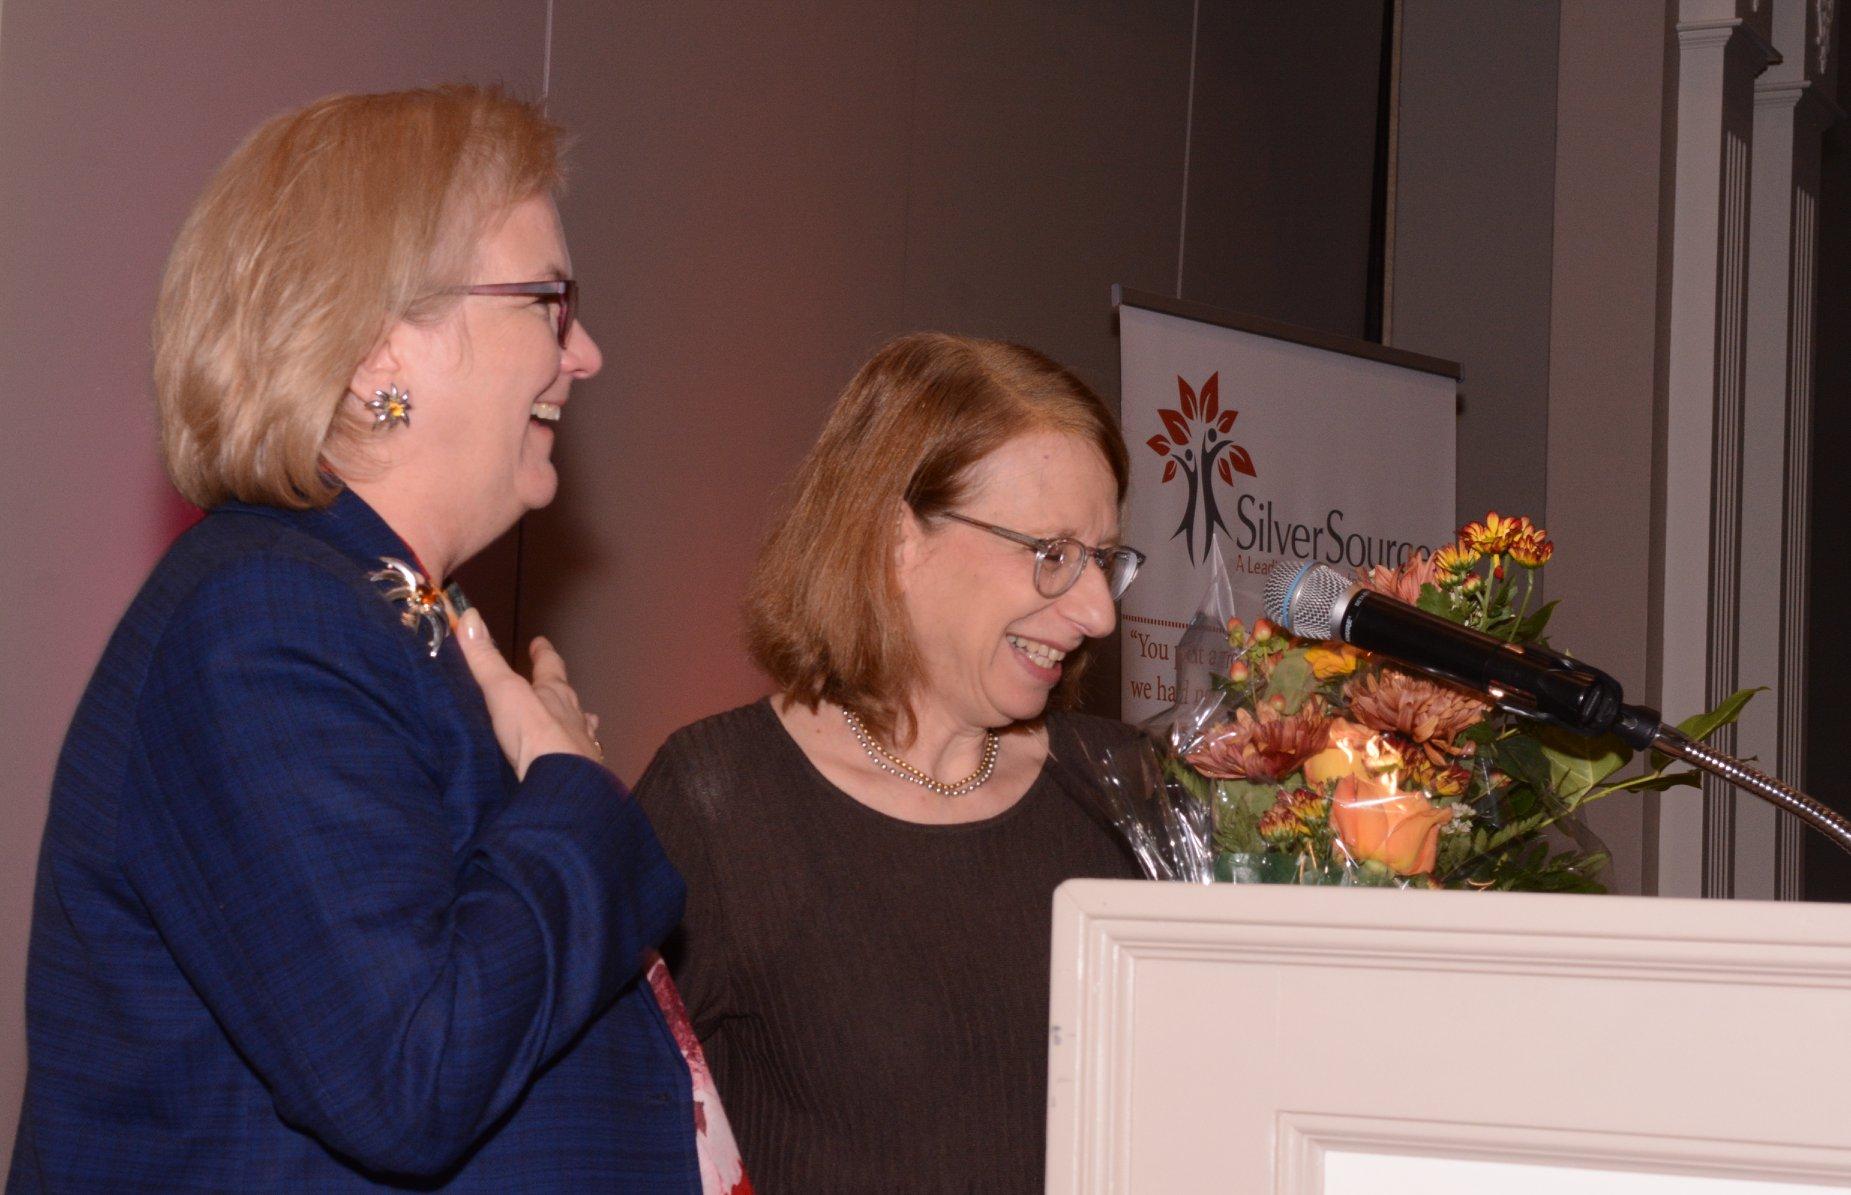 23-Kathleen Bordelon and Roz Chast laughing at podium